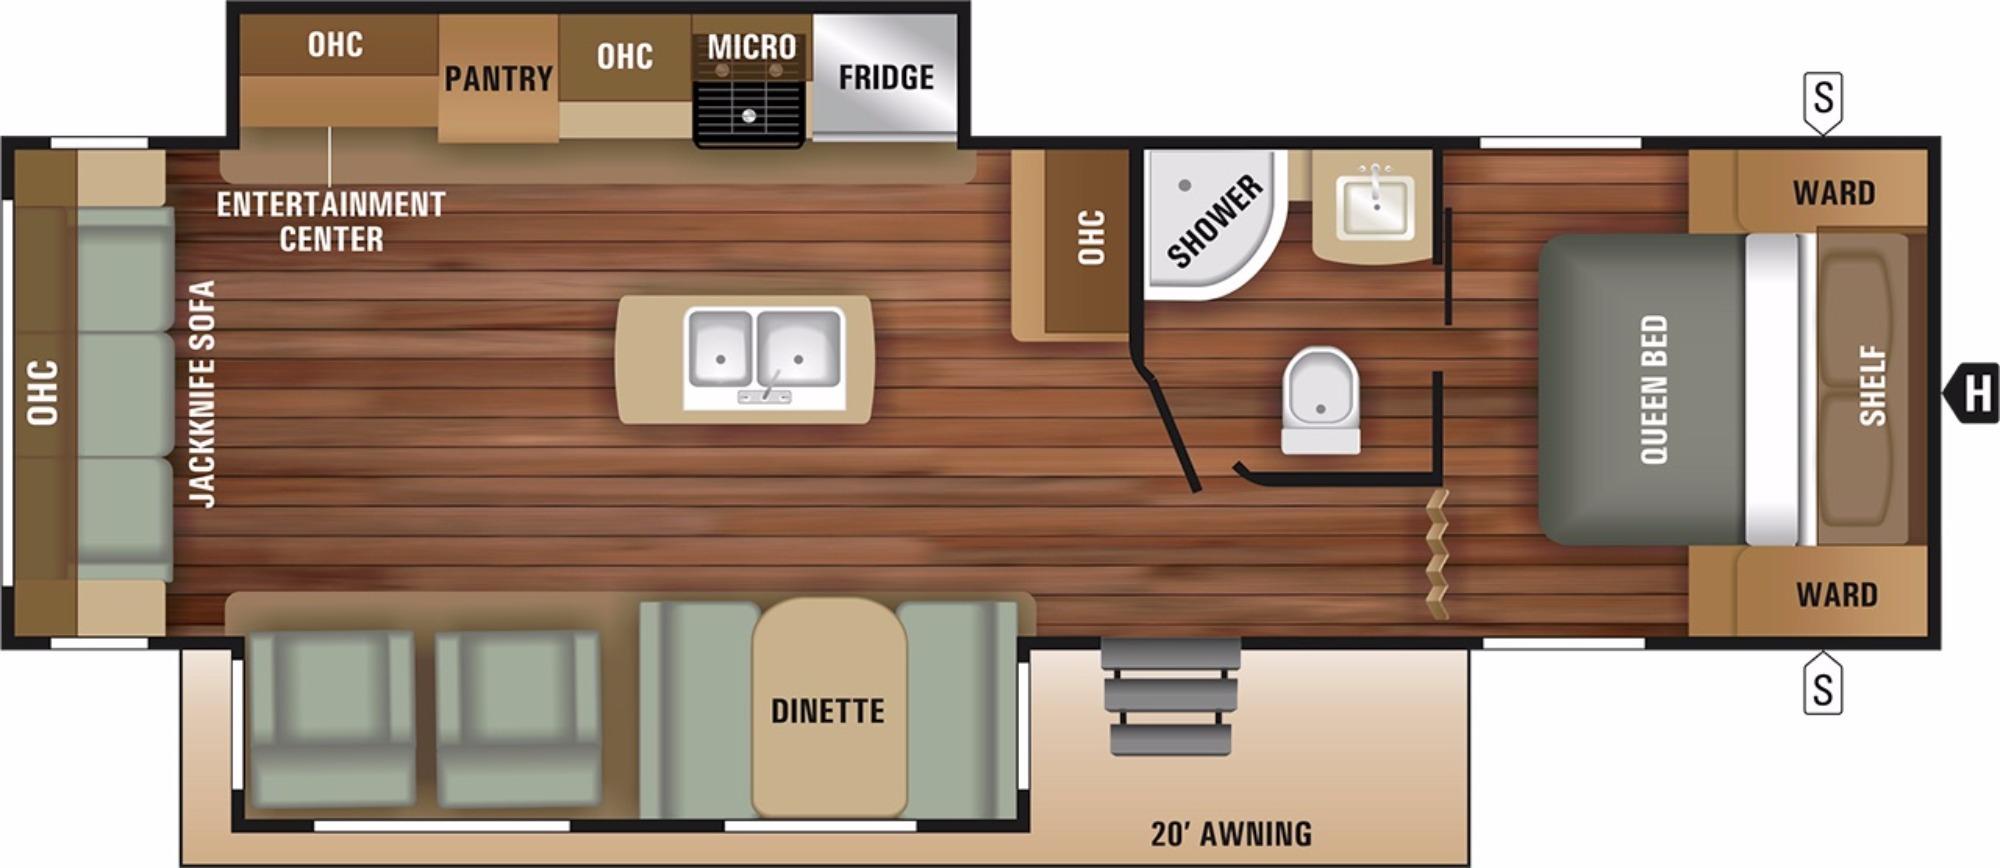 View Floor Plan for 2018 STARCRAFT AUTUMN RIDGE OUTFITTER 27RLI